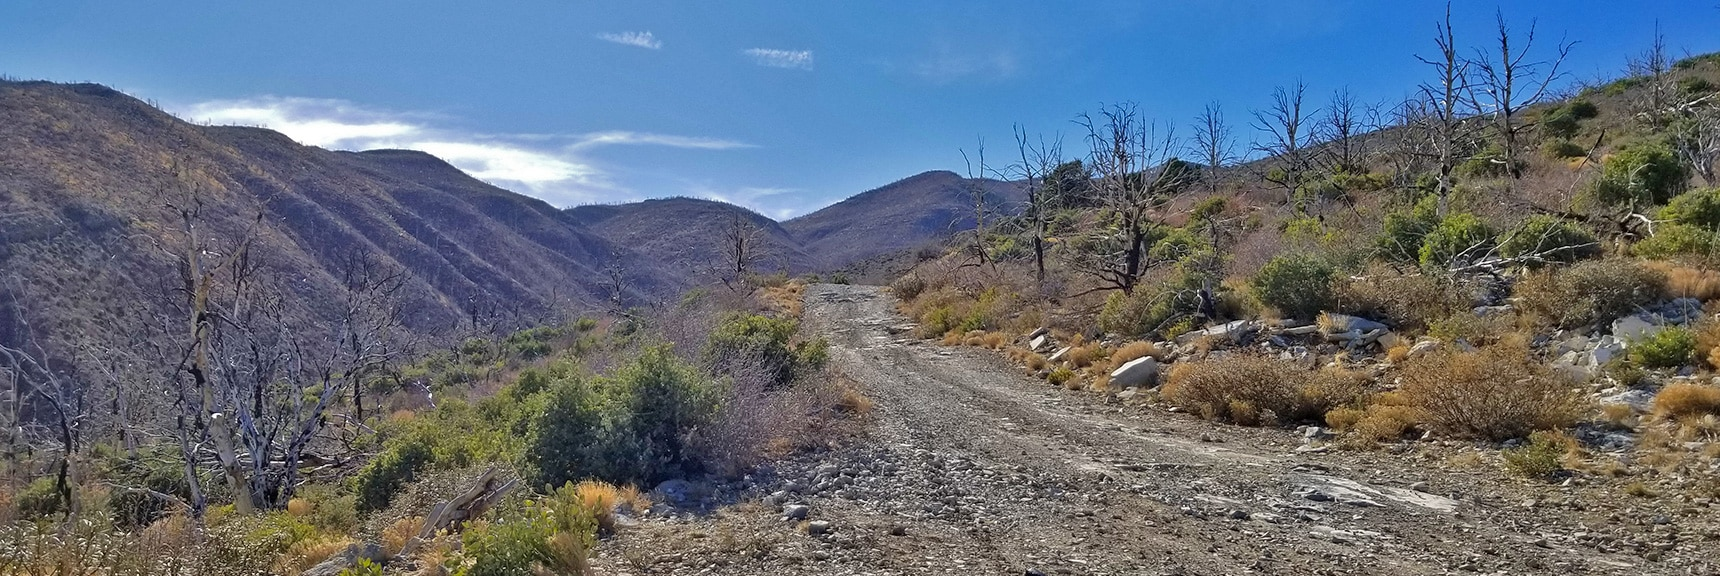 Heading Up Harris Mountain Rd Toward Harris Mt. Skirting Canyon on Left.   Harris Springs Rd, Harris Mountain Rd   Spring Mountains Wilderness, Nevada